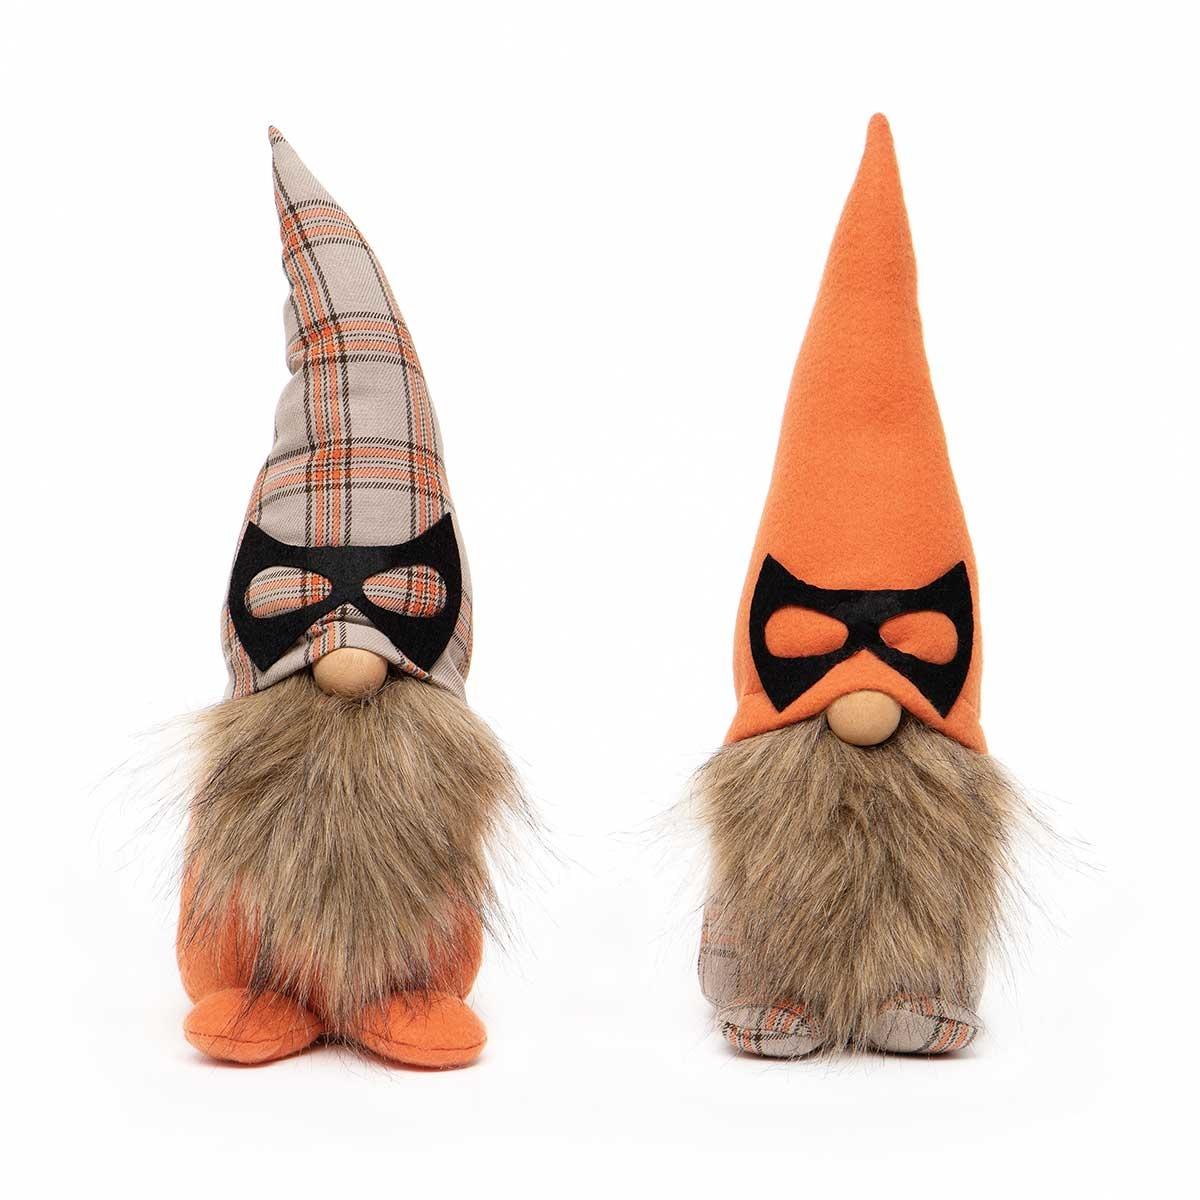 Gnome 13.5 Plaid Mask Hat